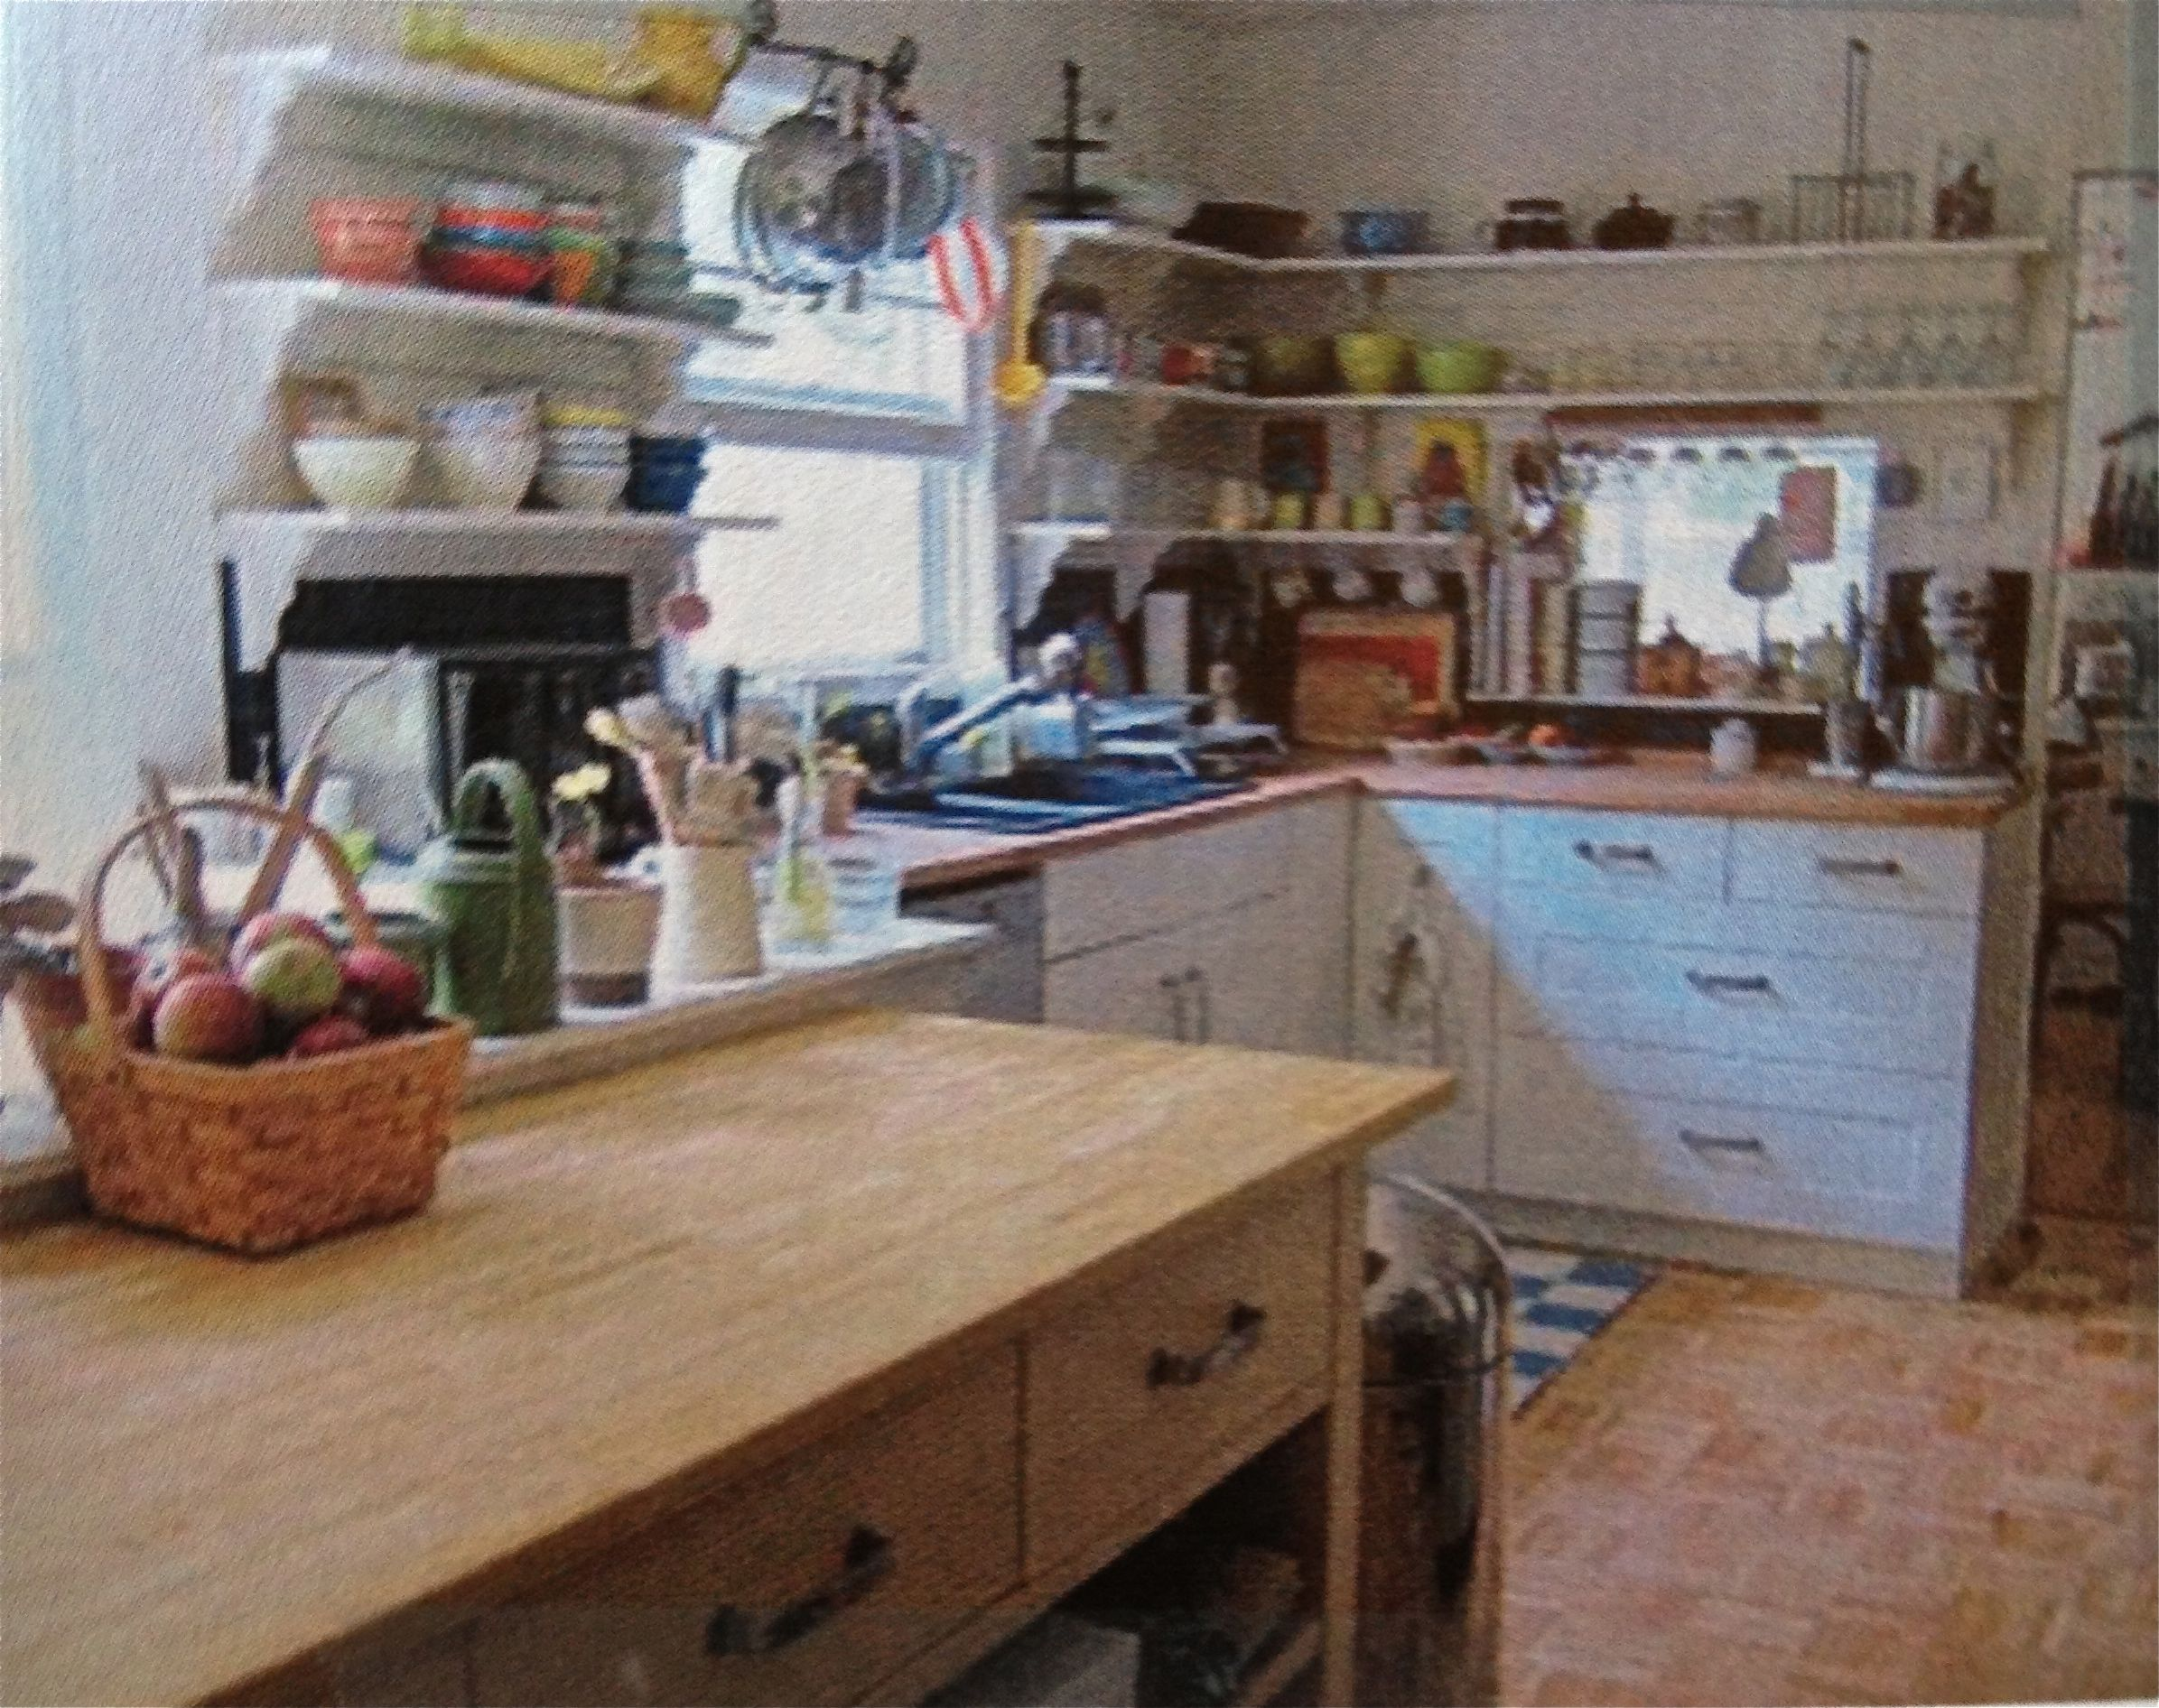 Bakers Kitchen Baker S Kitchen Ideas Eclectic Kitchen Ikea